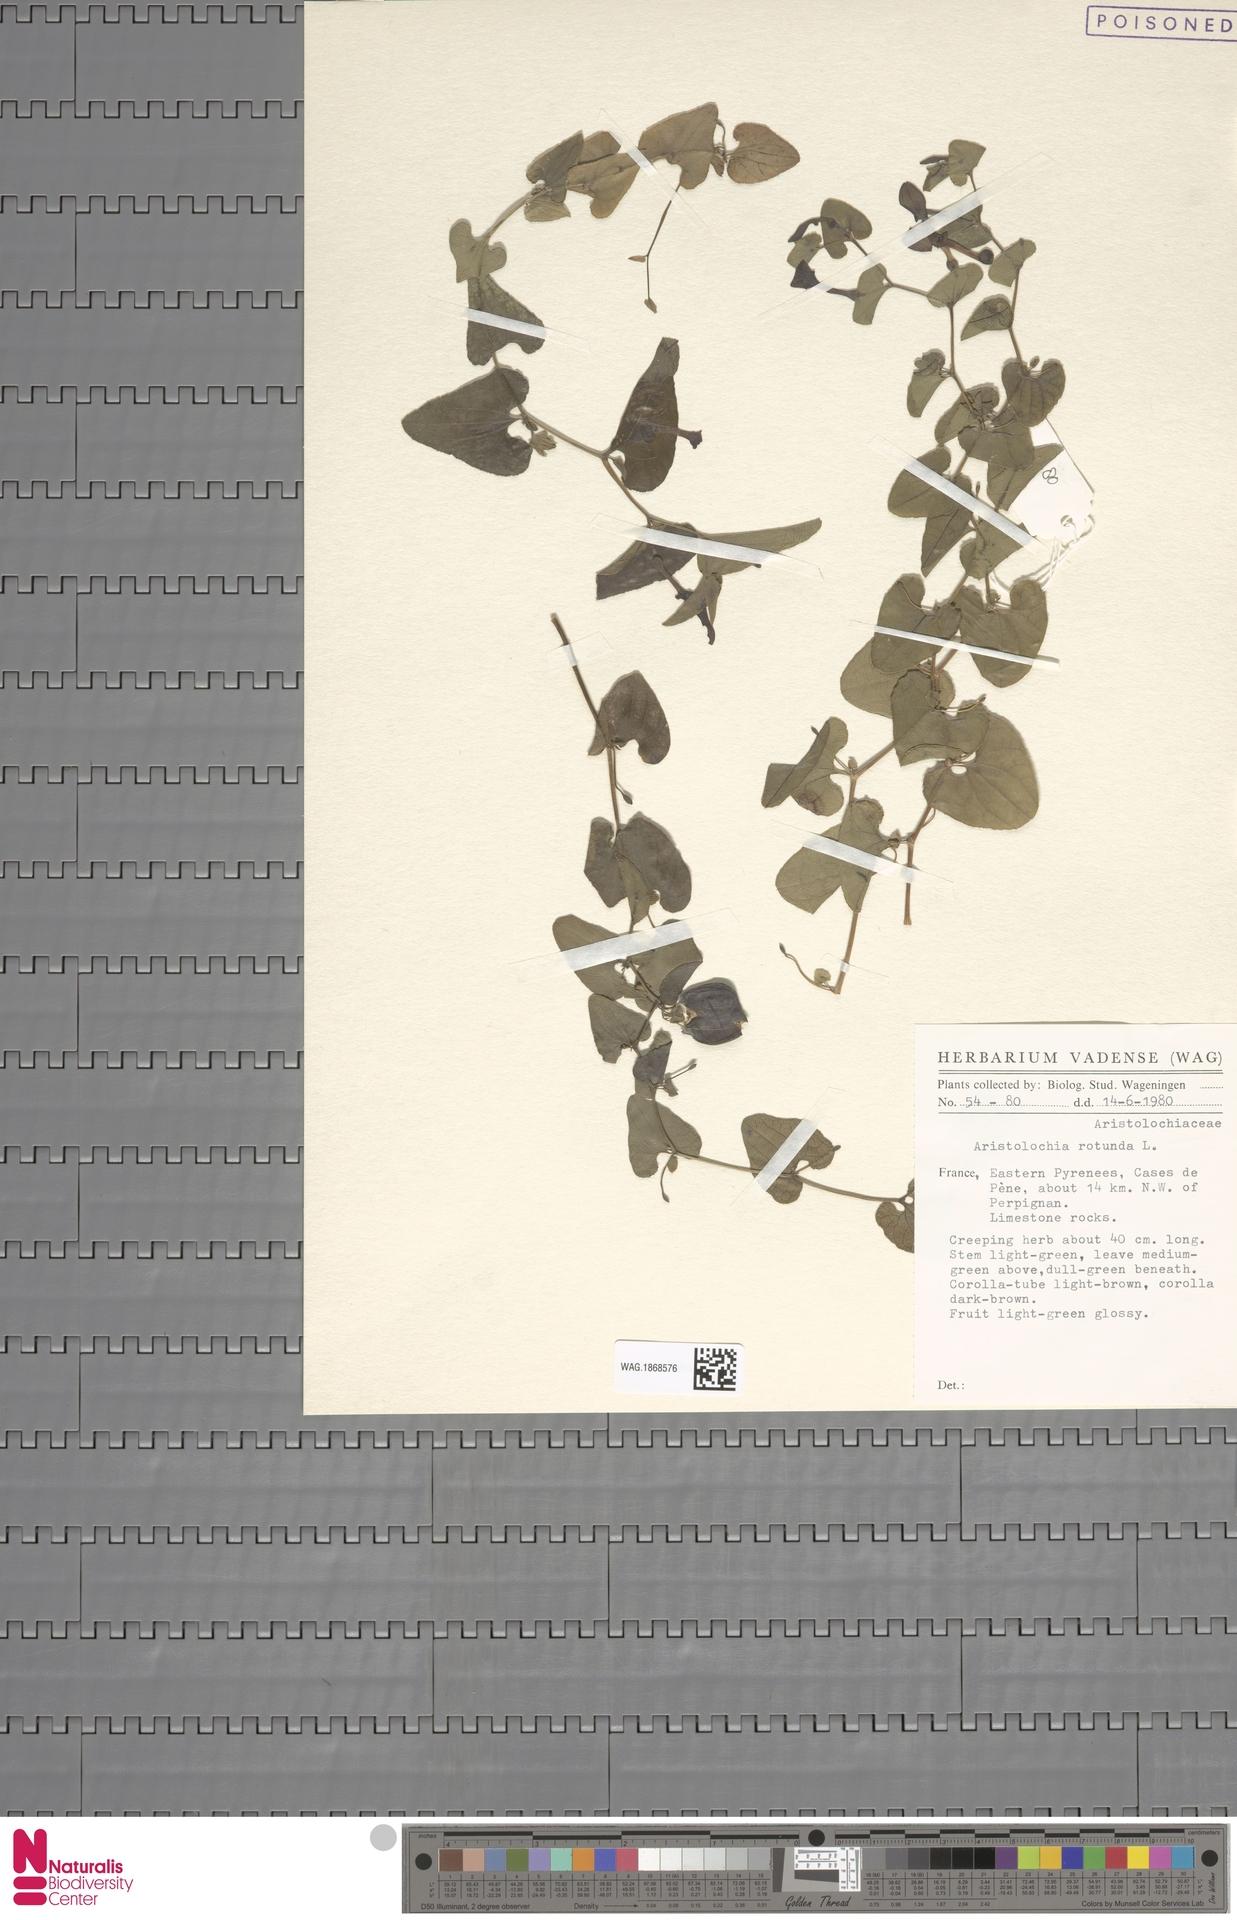 WAG.1868576 | Aristolochia rotunda L.